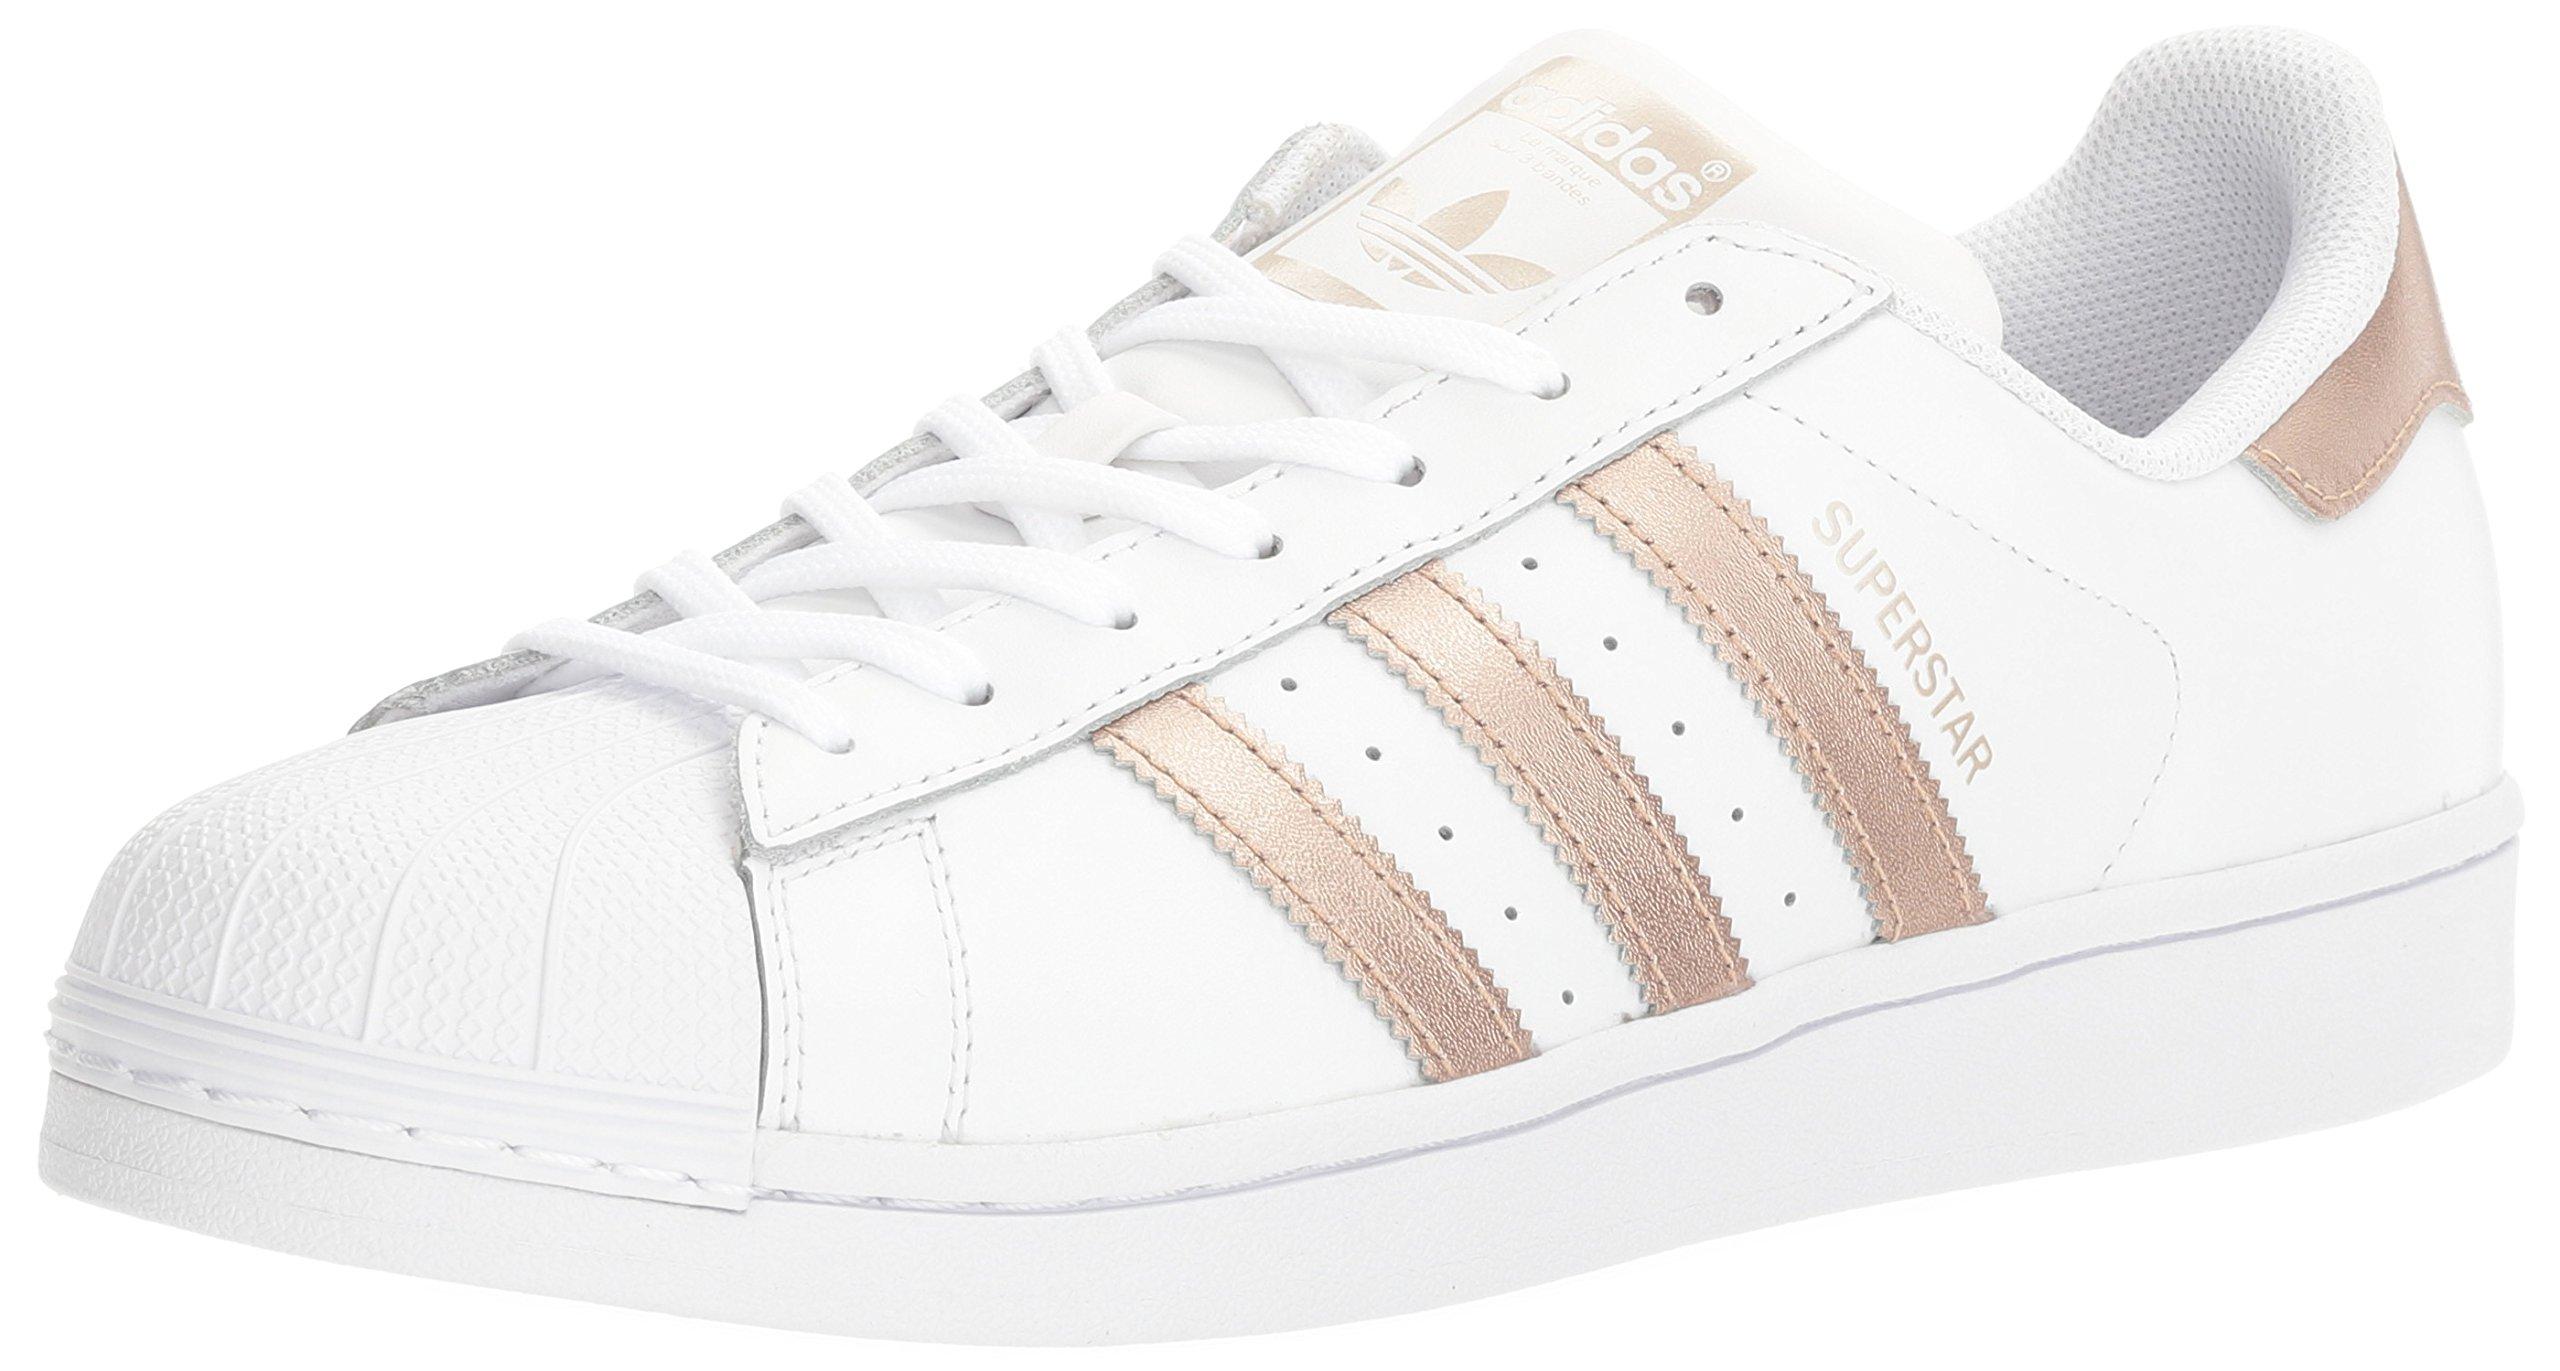 Archive Adidas Superstar II Adicolor Sneakerhead 562905